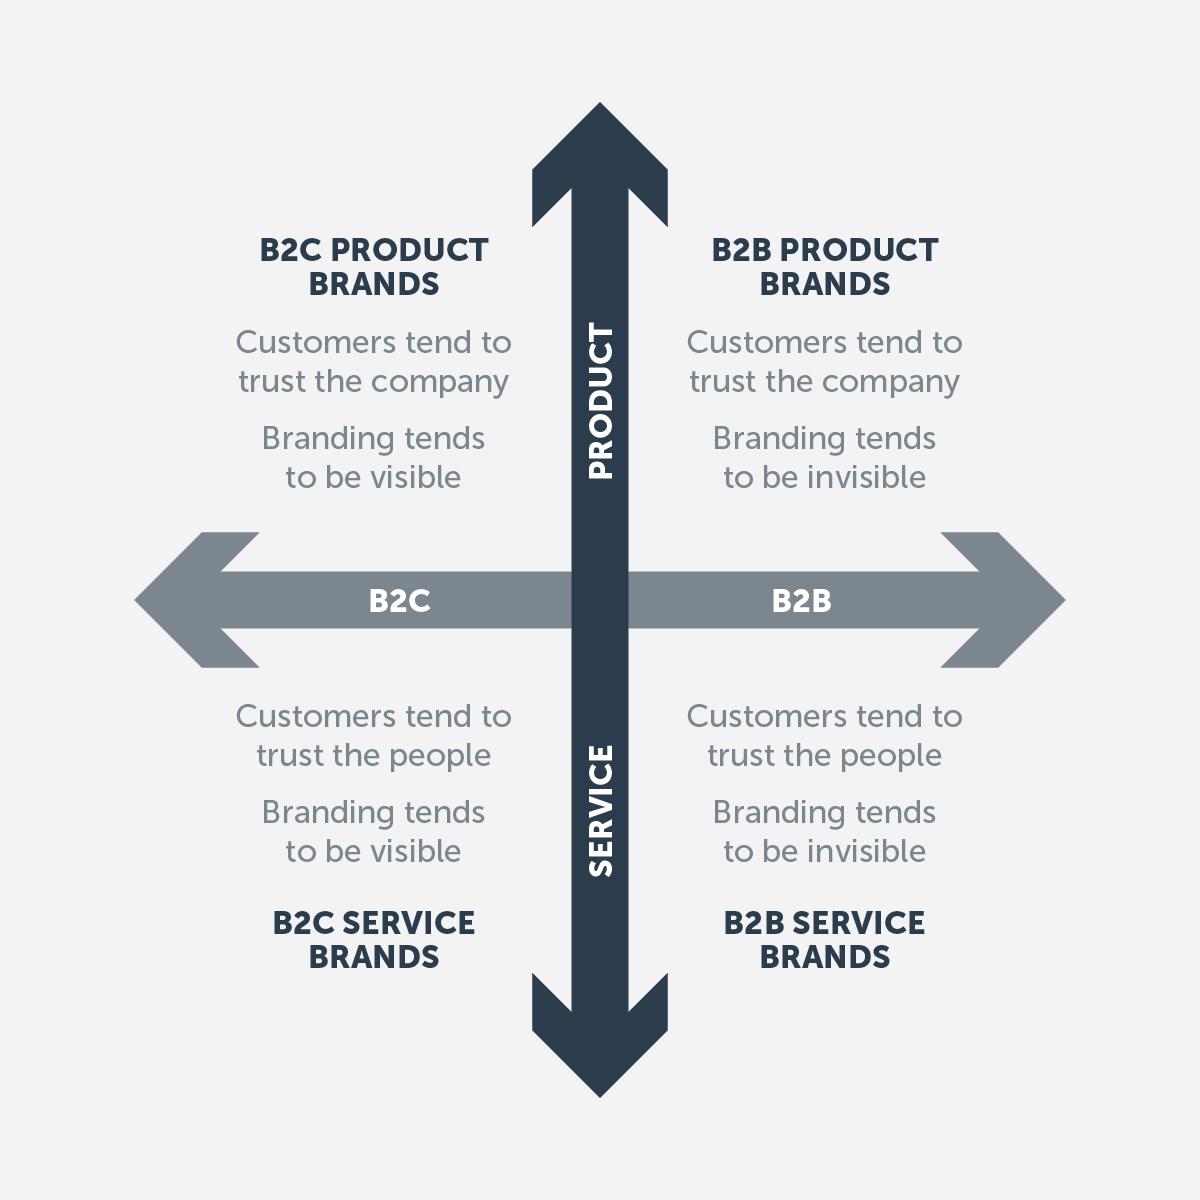 B2B vs B2C branding